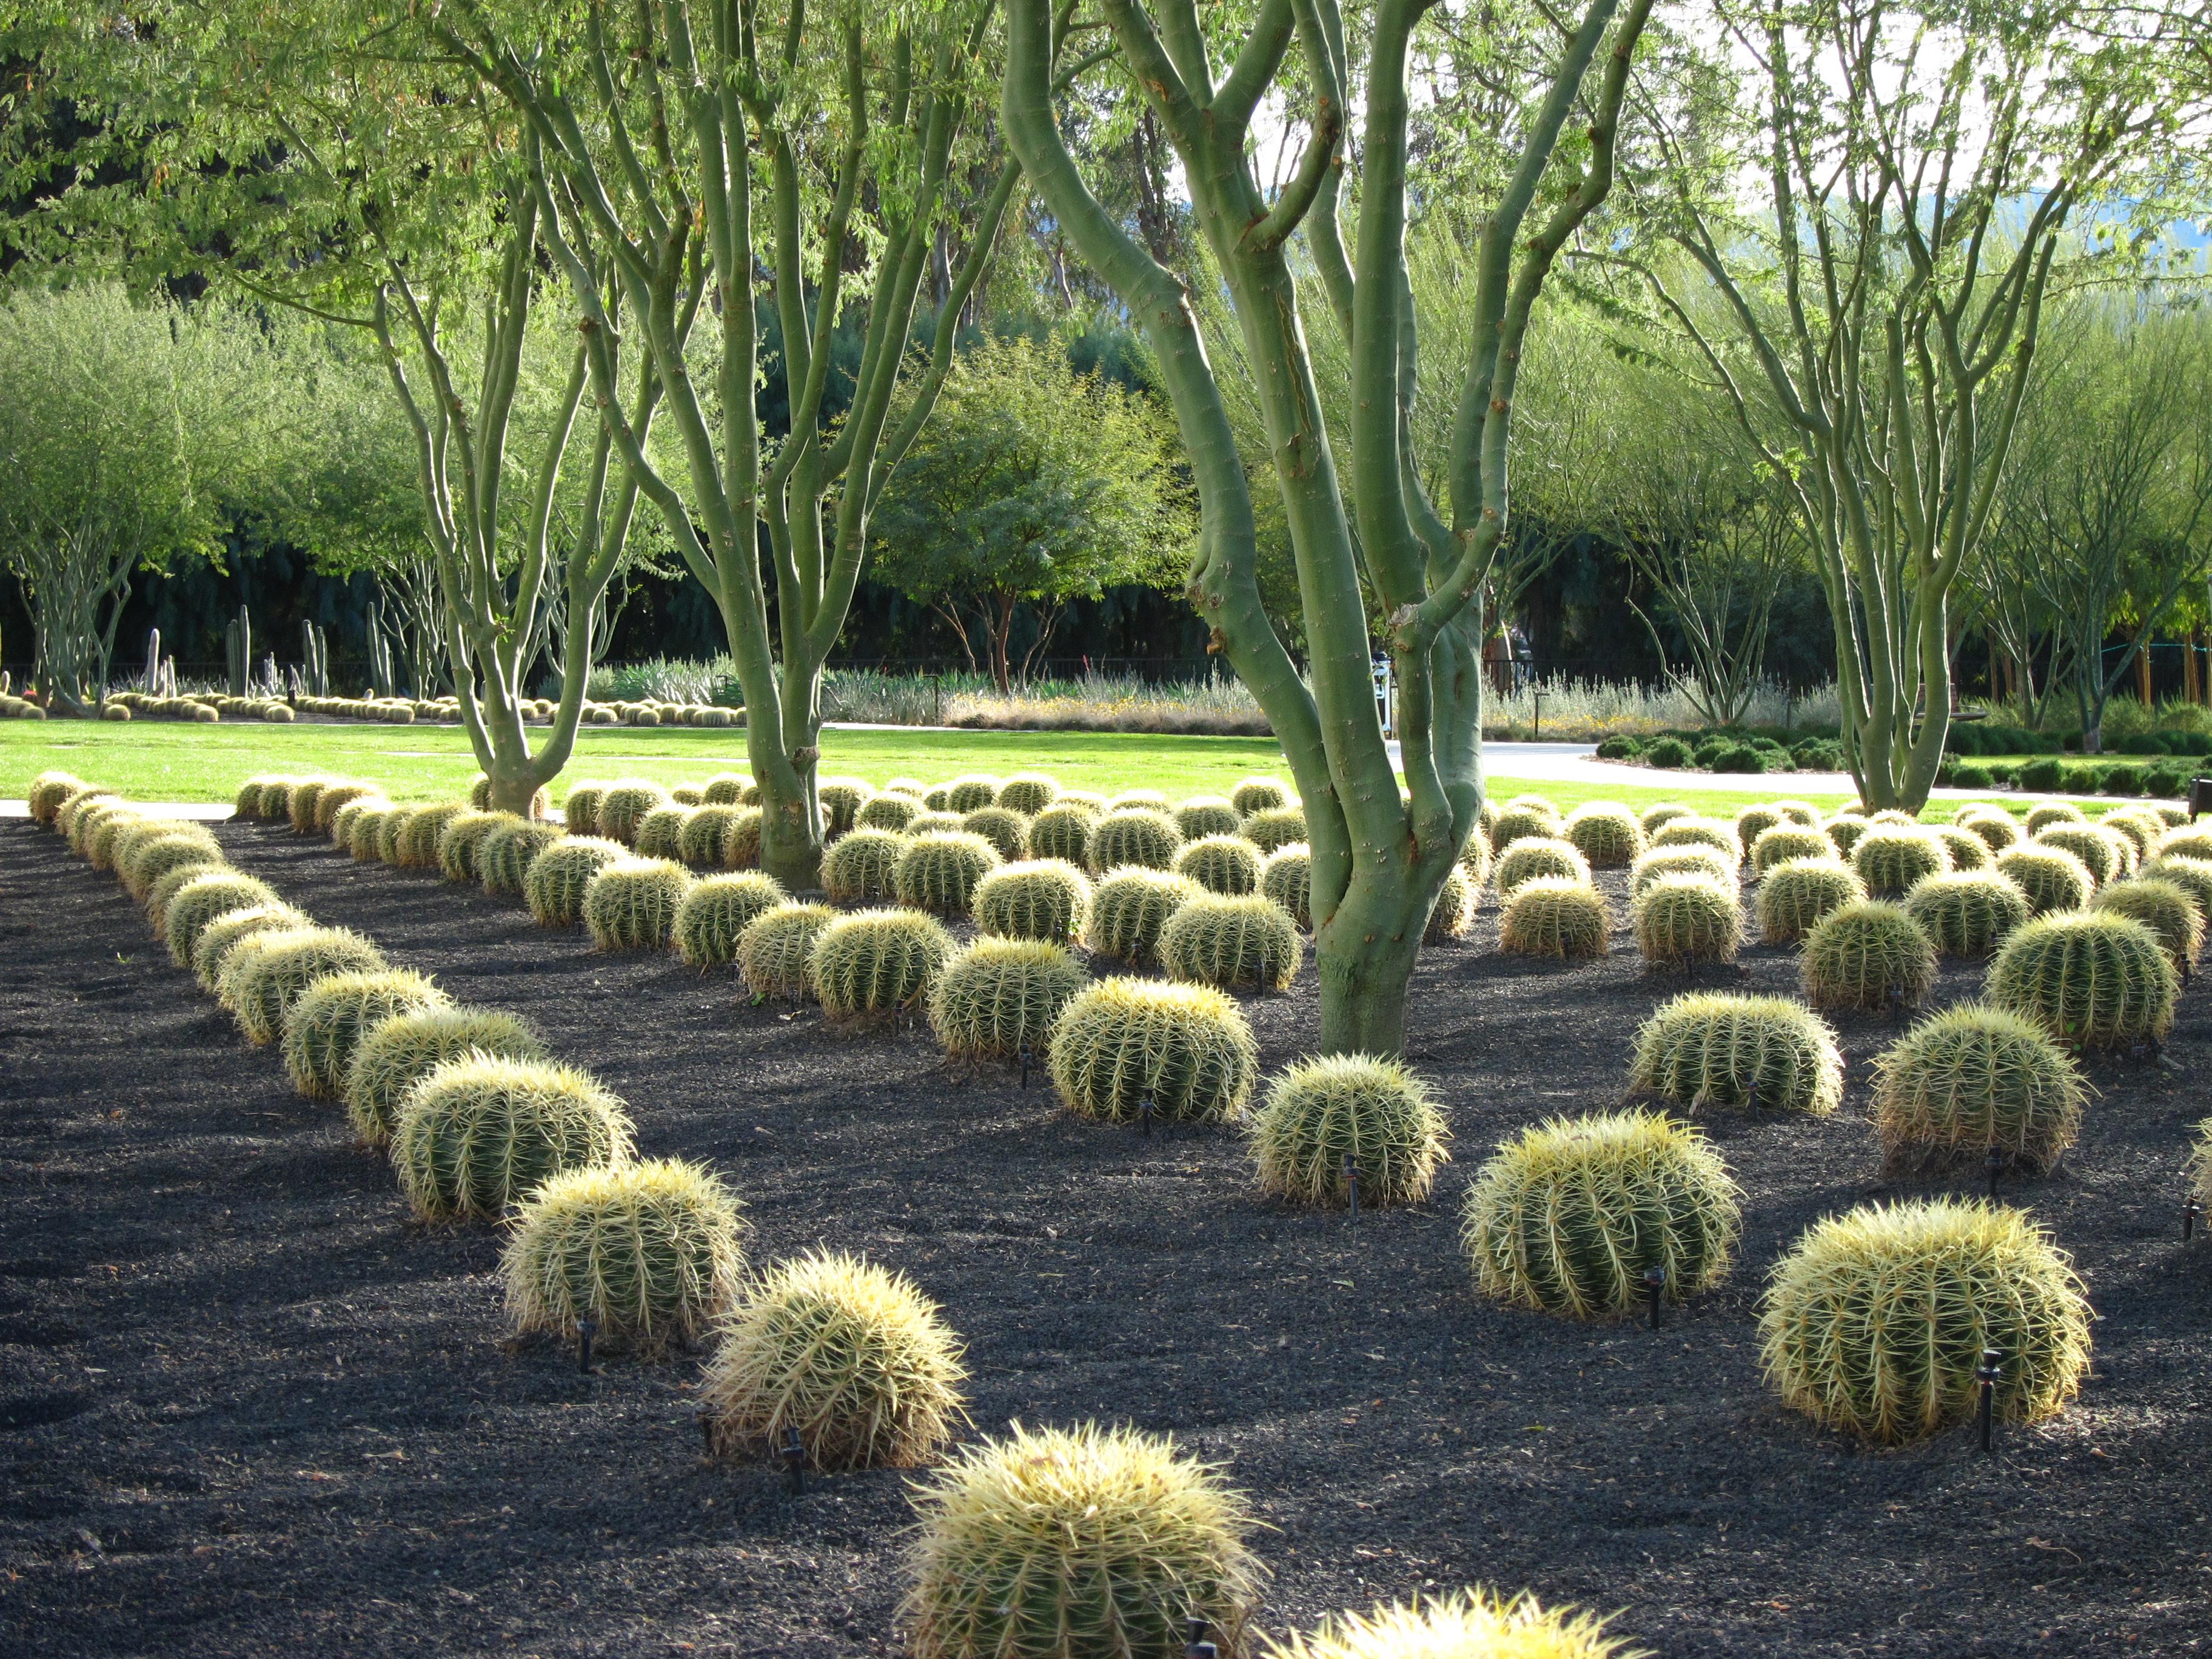 Asla 2012 professional awards sunnylands center gardens for Gardening and landscaping